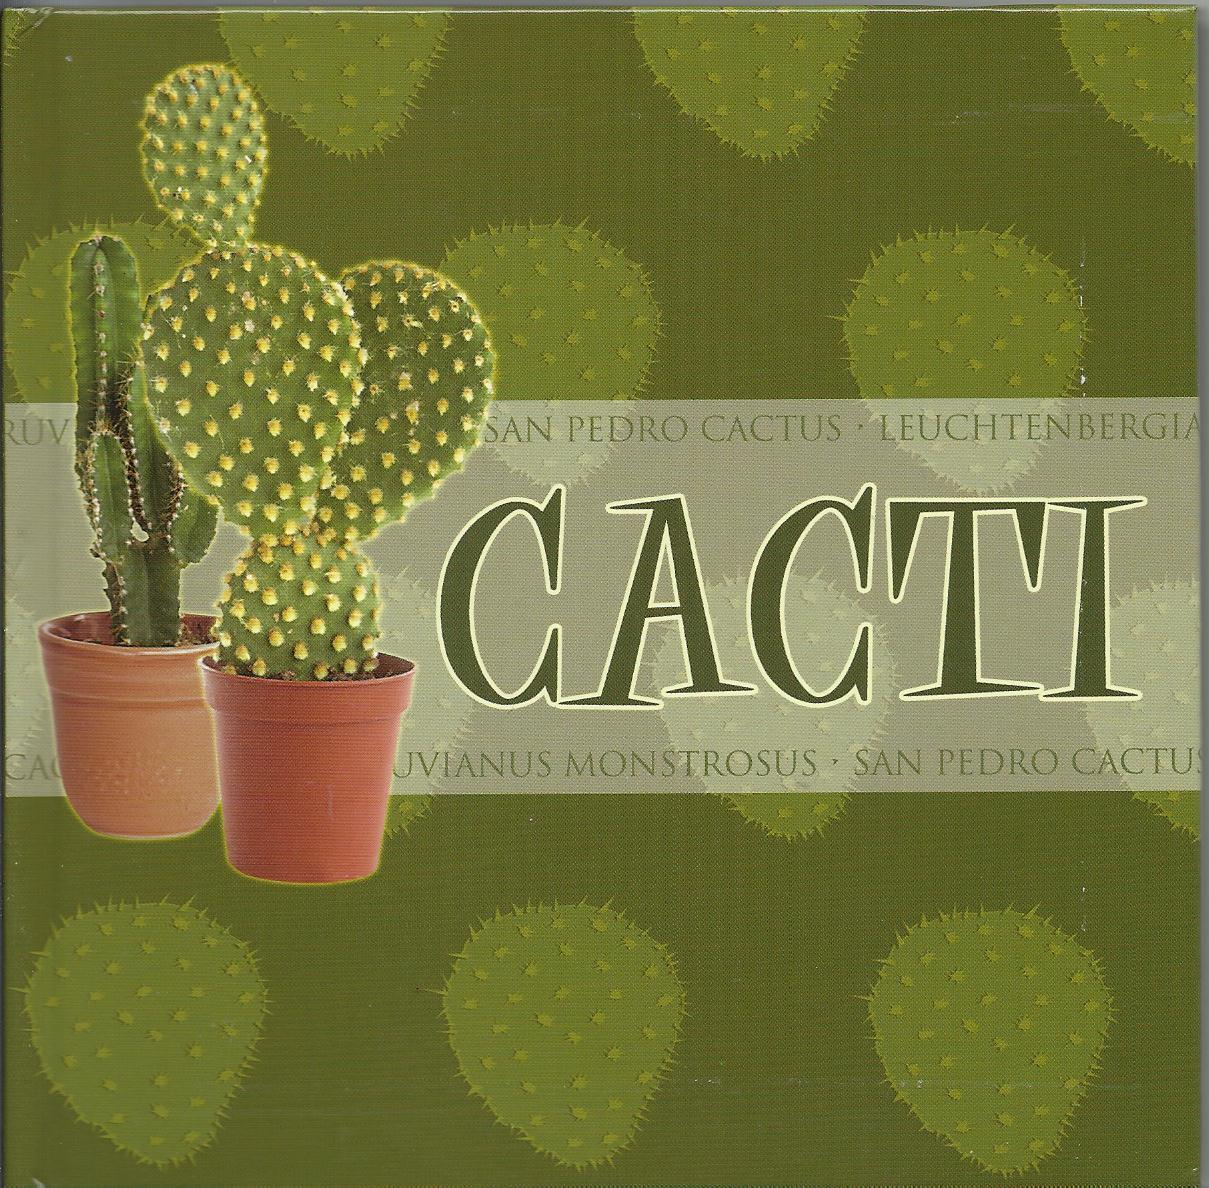 Cacti  2004 Susan Stephenson Cactus beginner growing Kit book trowel  pot H4